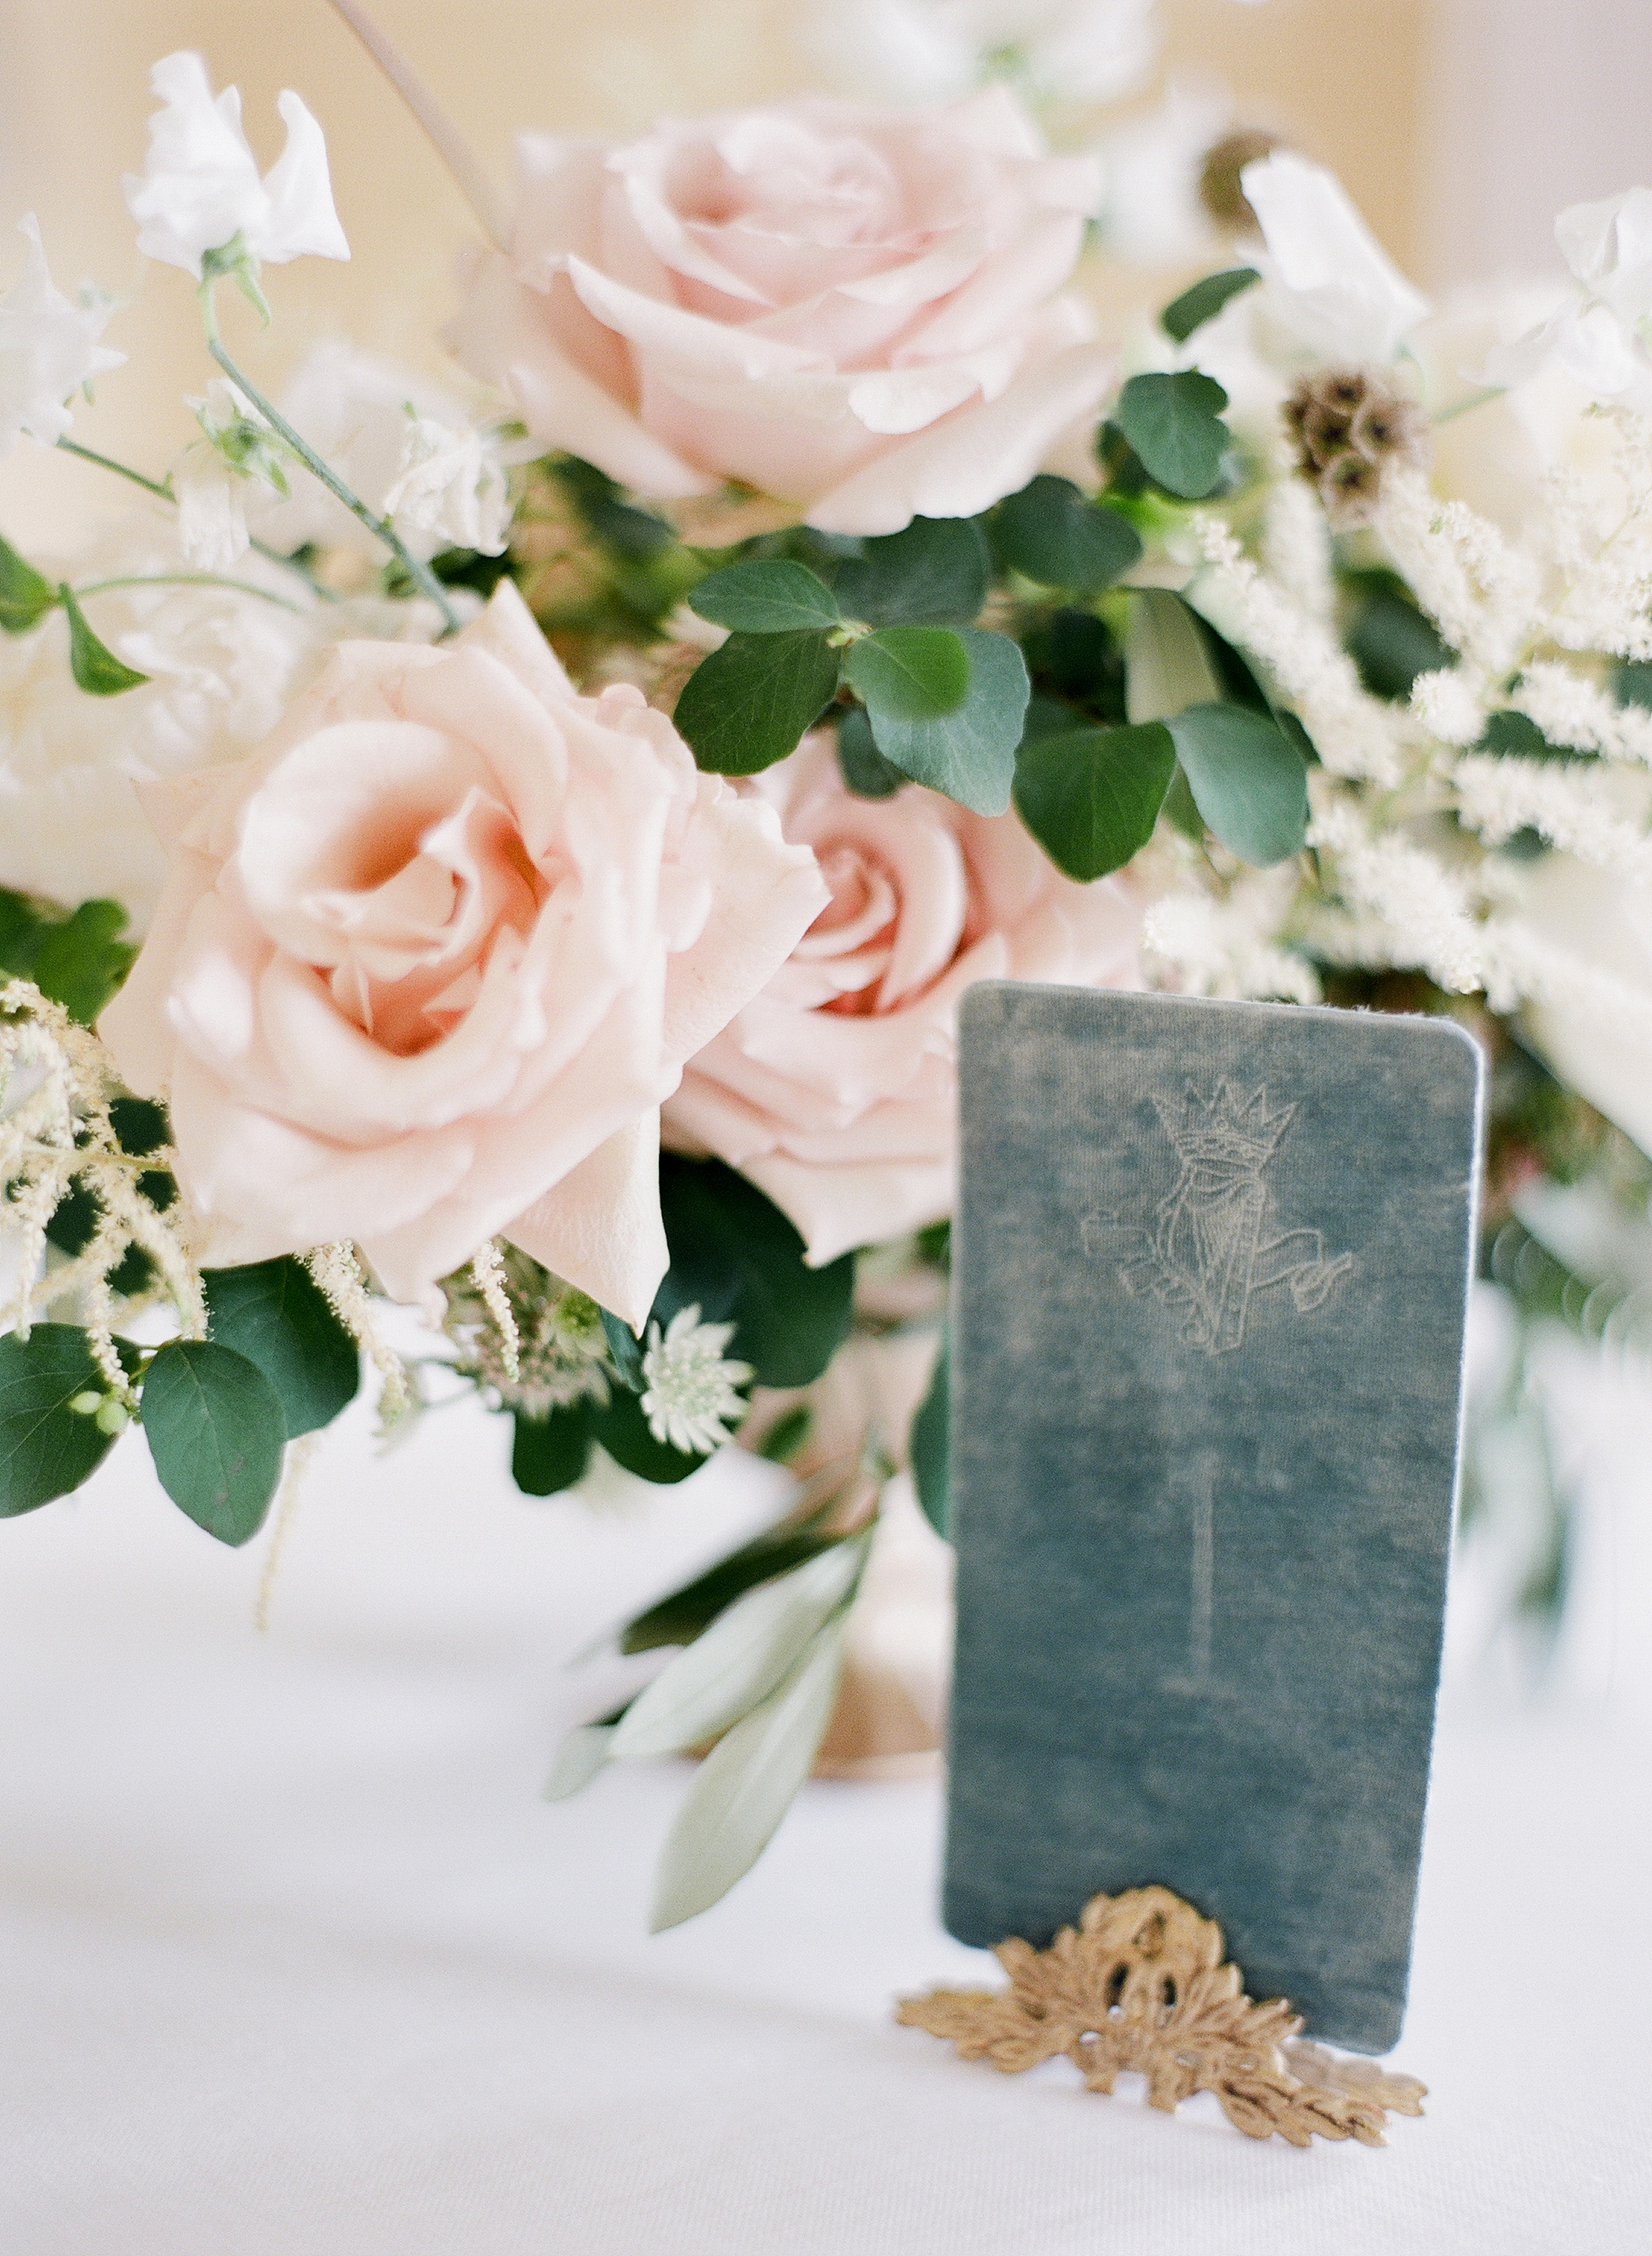 velvet wedding ideas taylor and porter